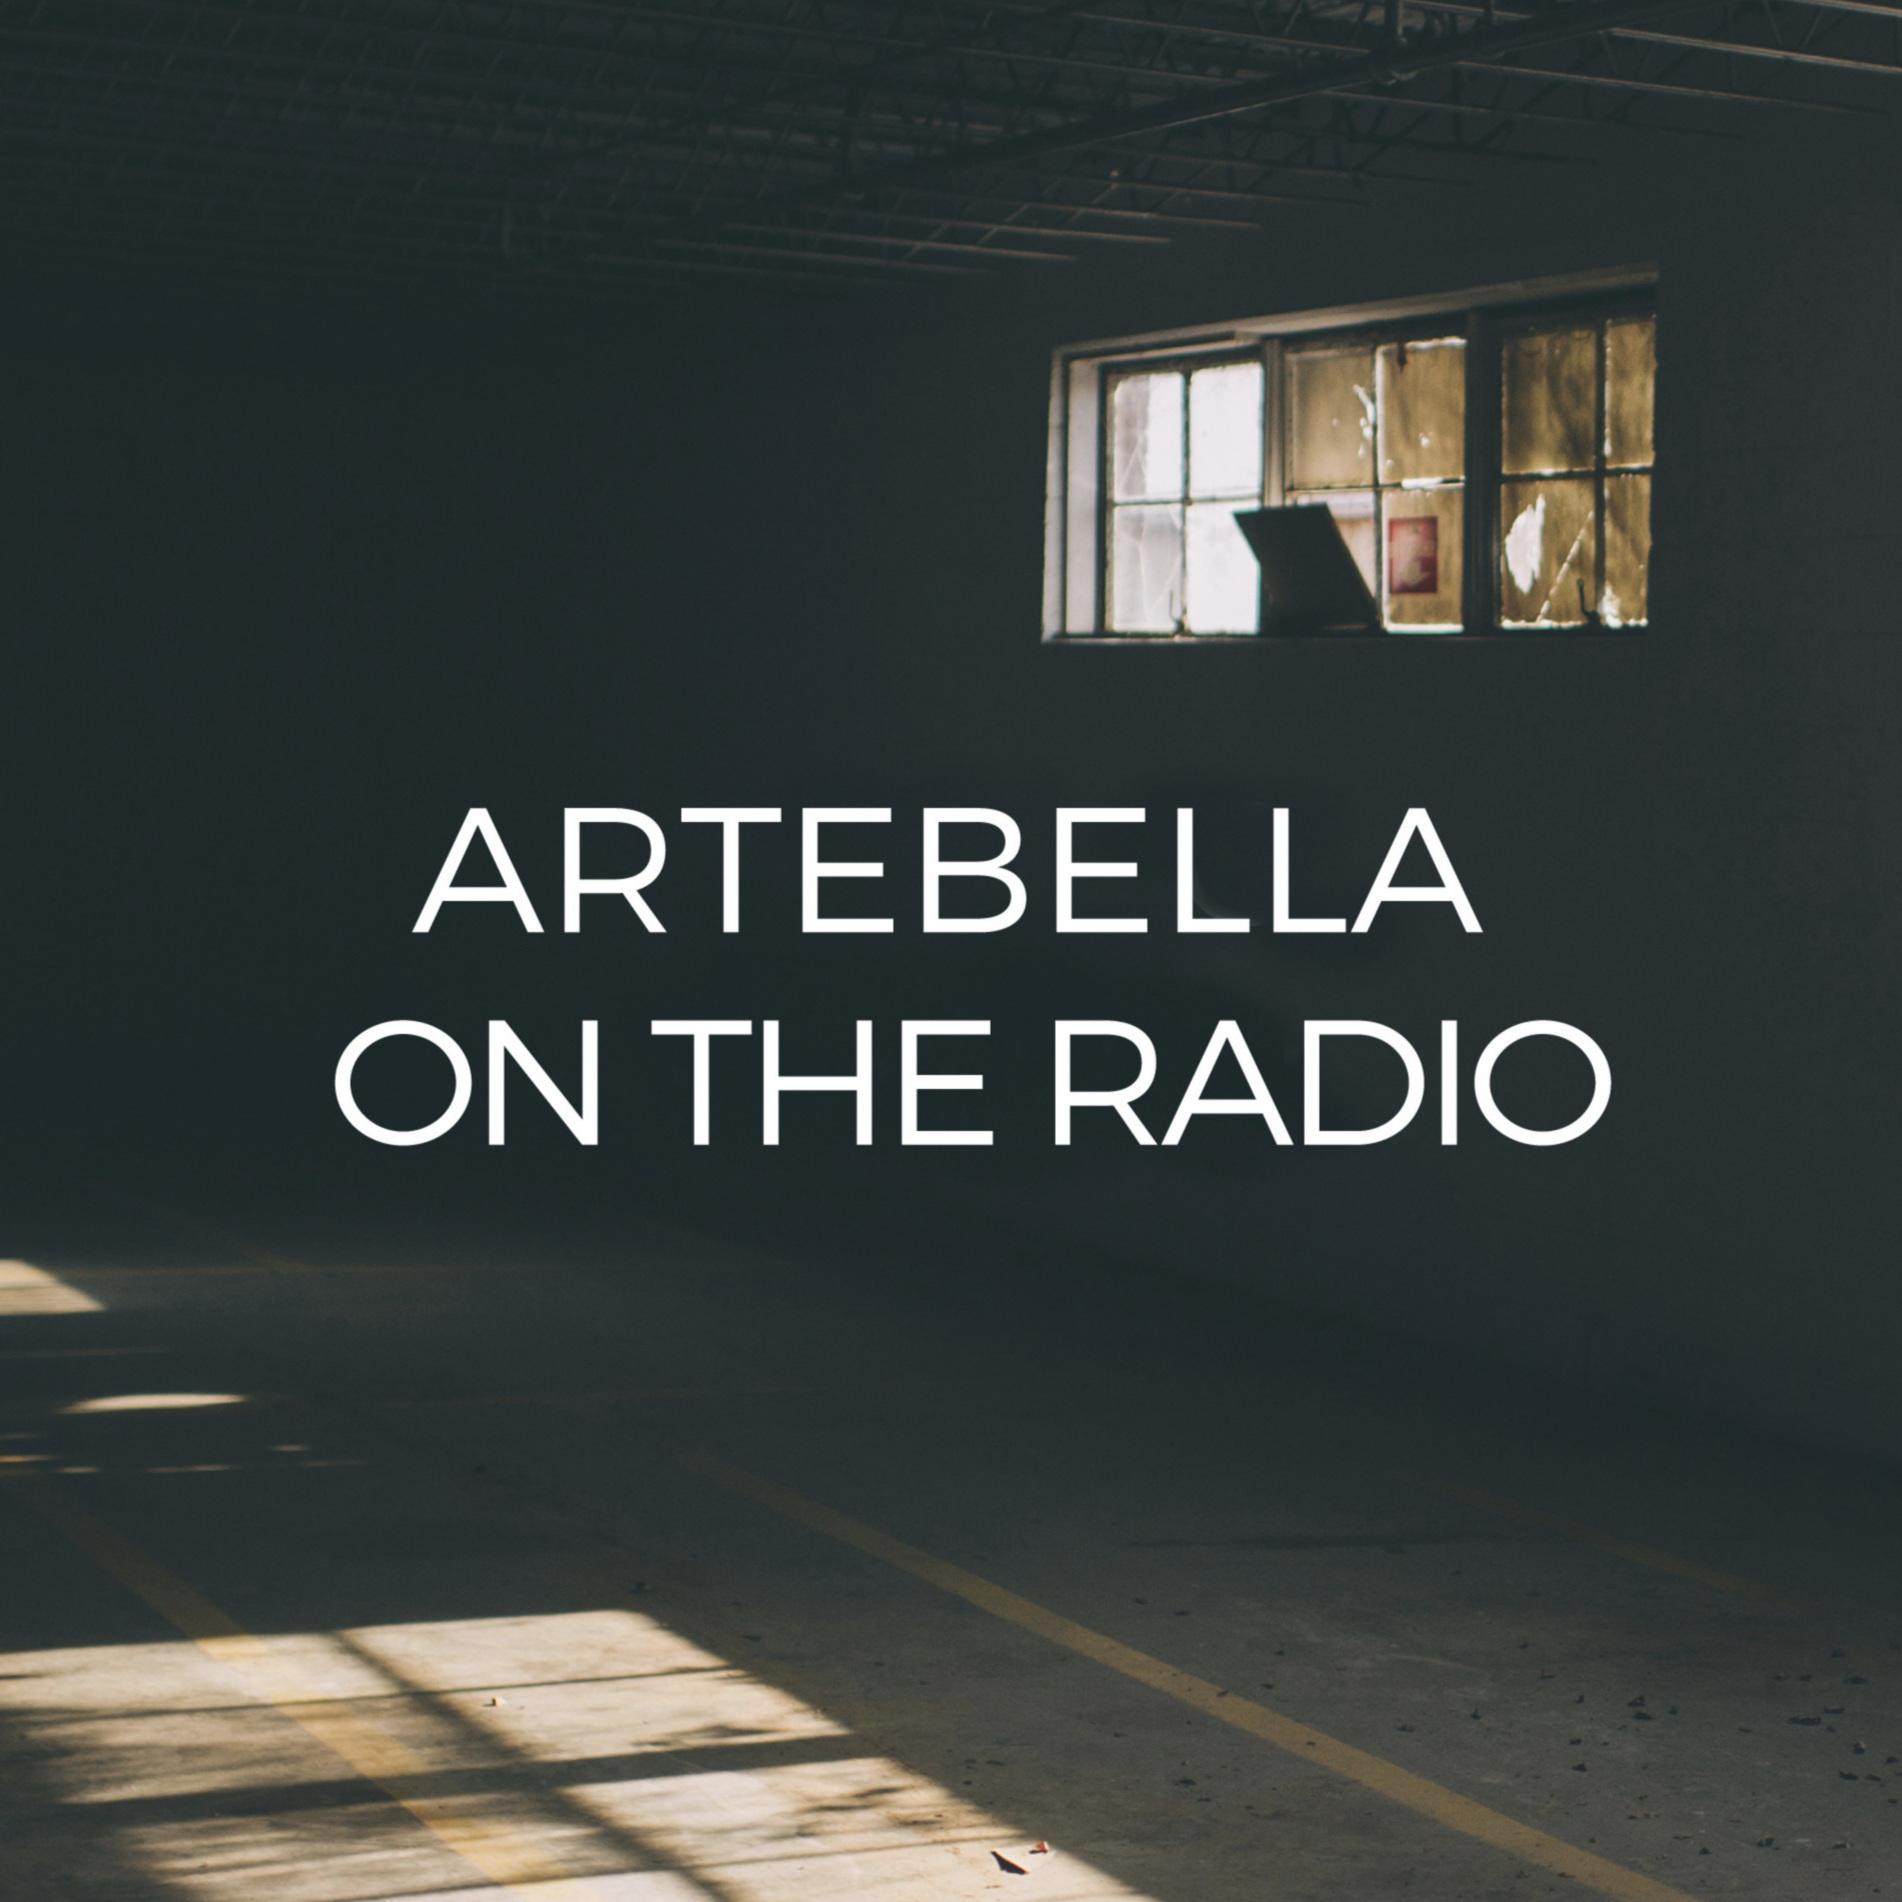 artebella+radio.jpg